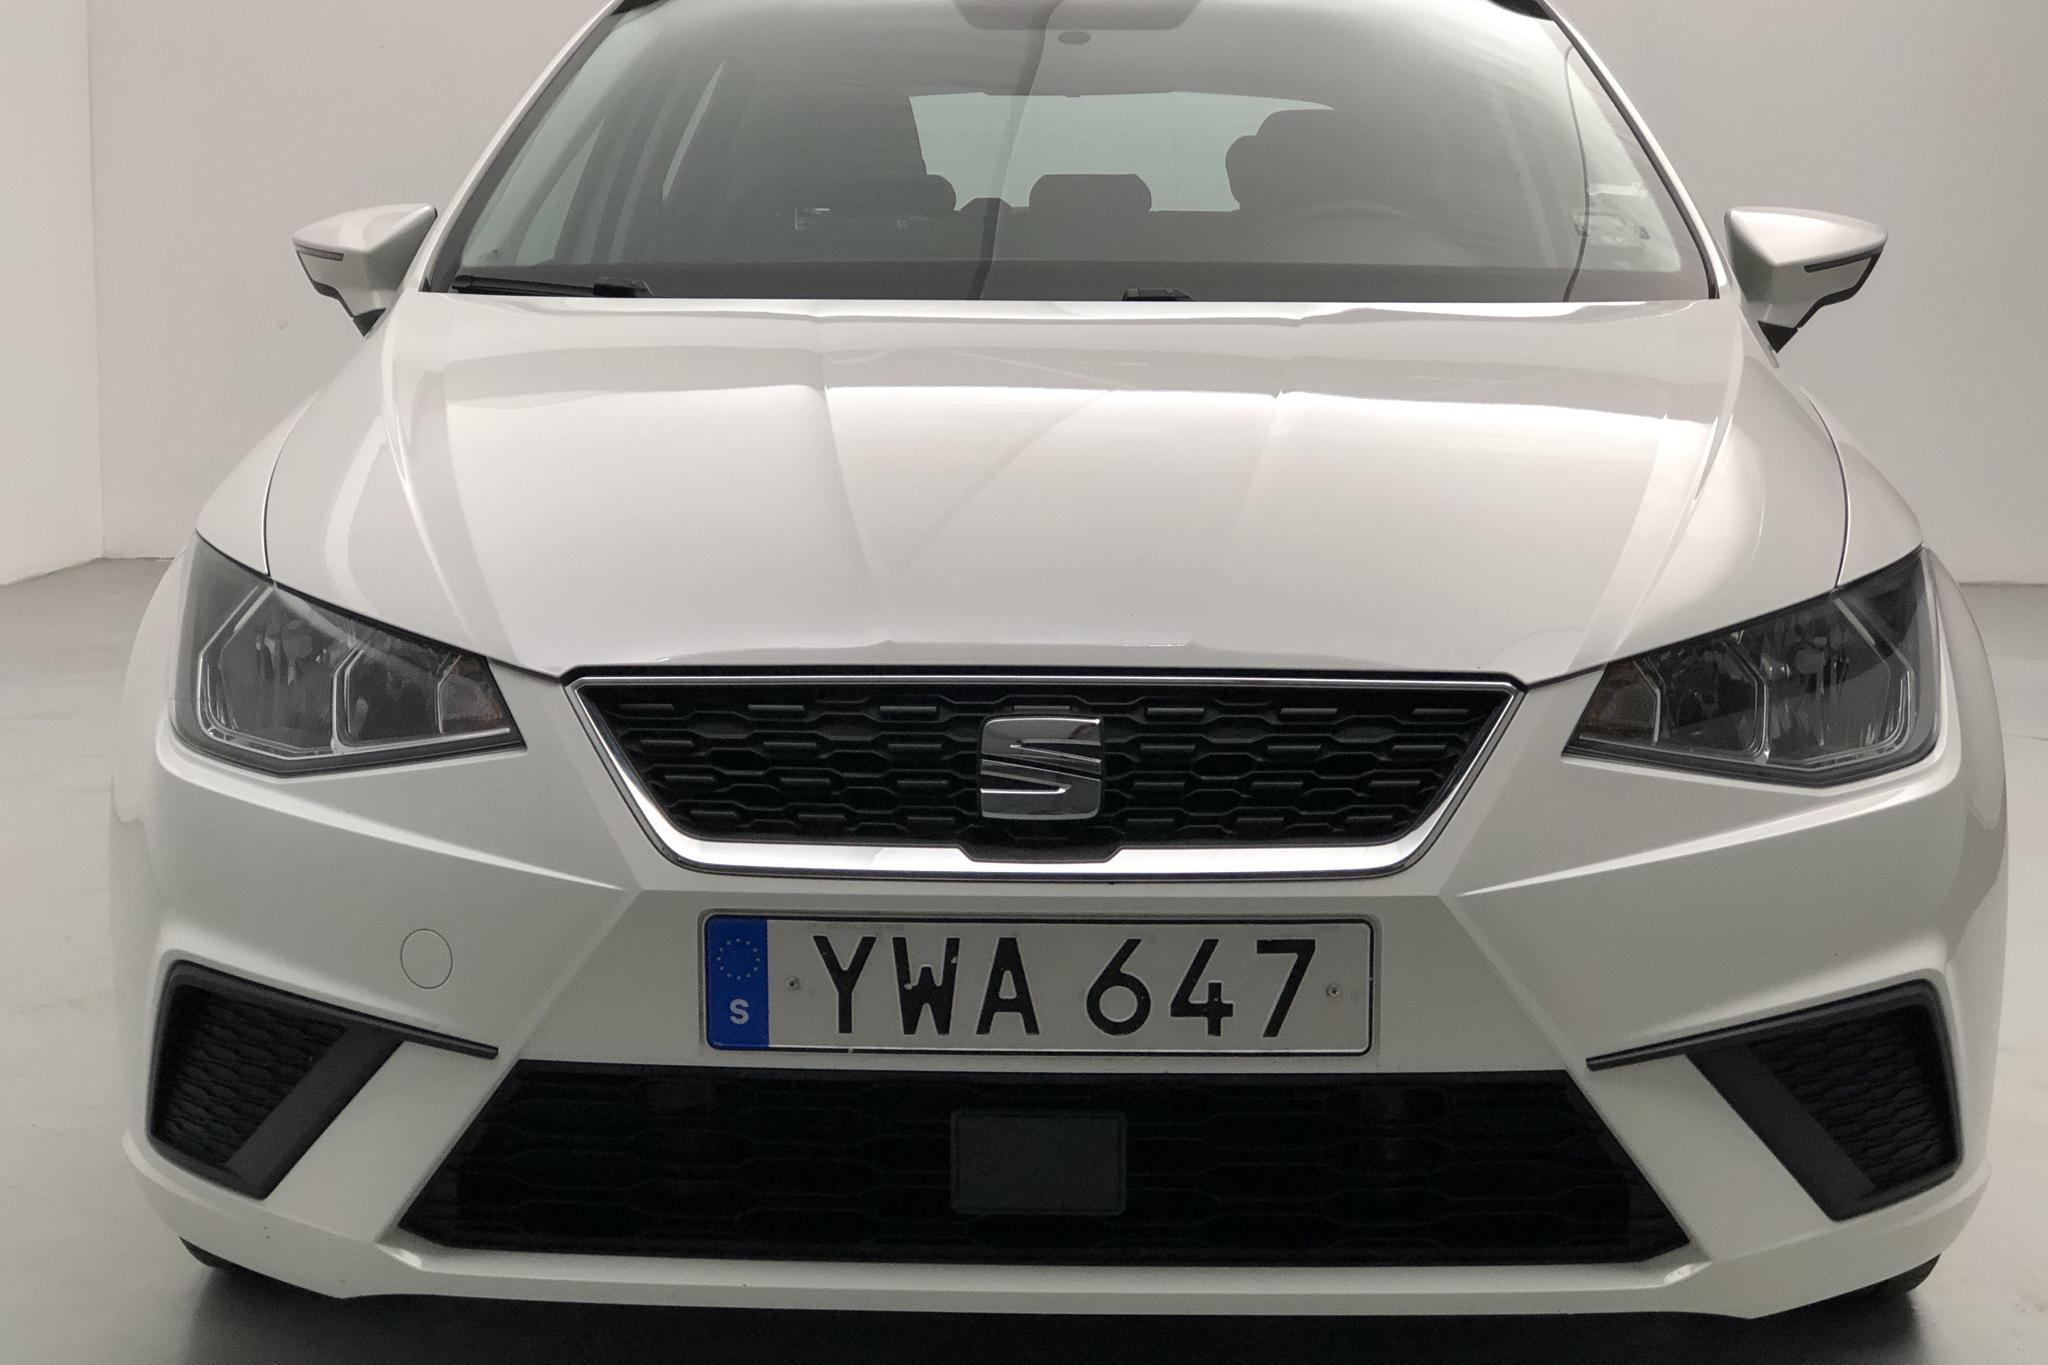 Seat Ibiza 1.0 TSI 5dr (95hk) - 7 533 mil - Manuell - vit - 2018